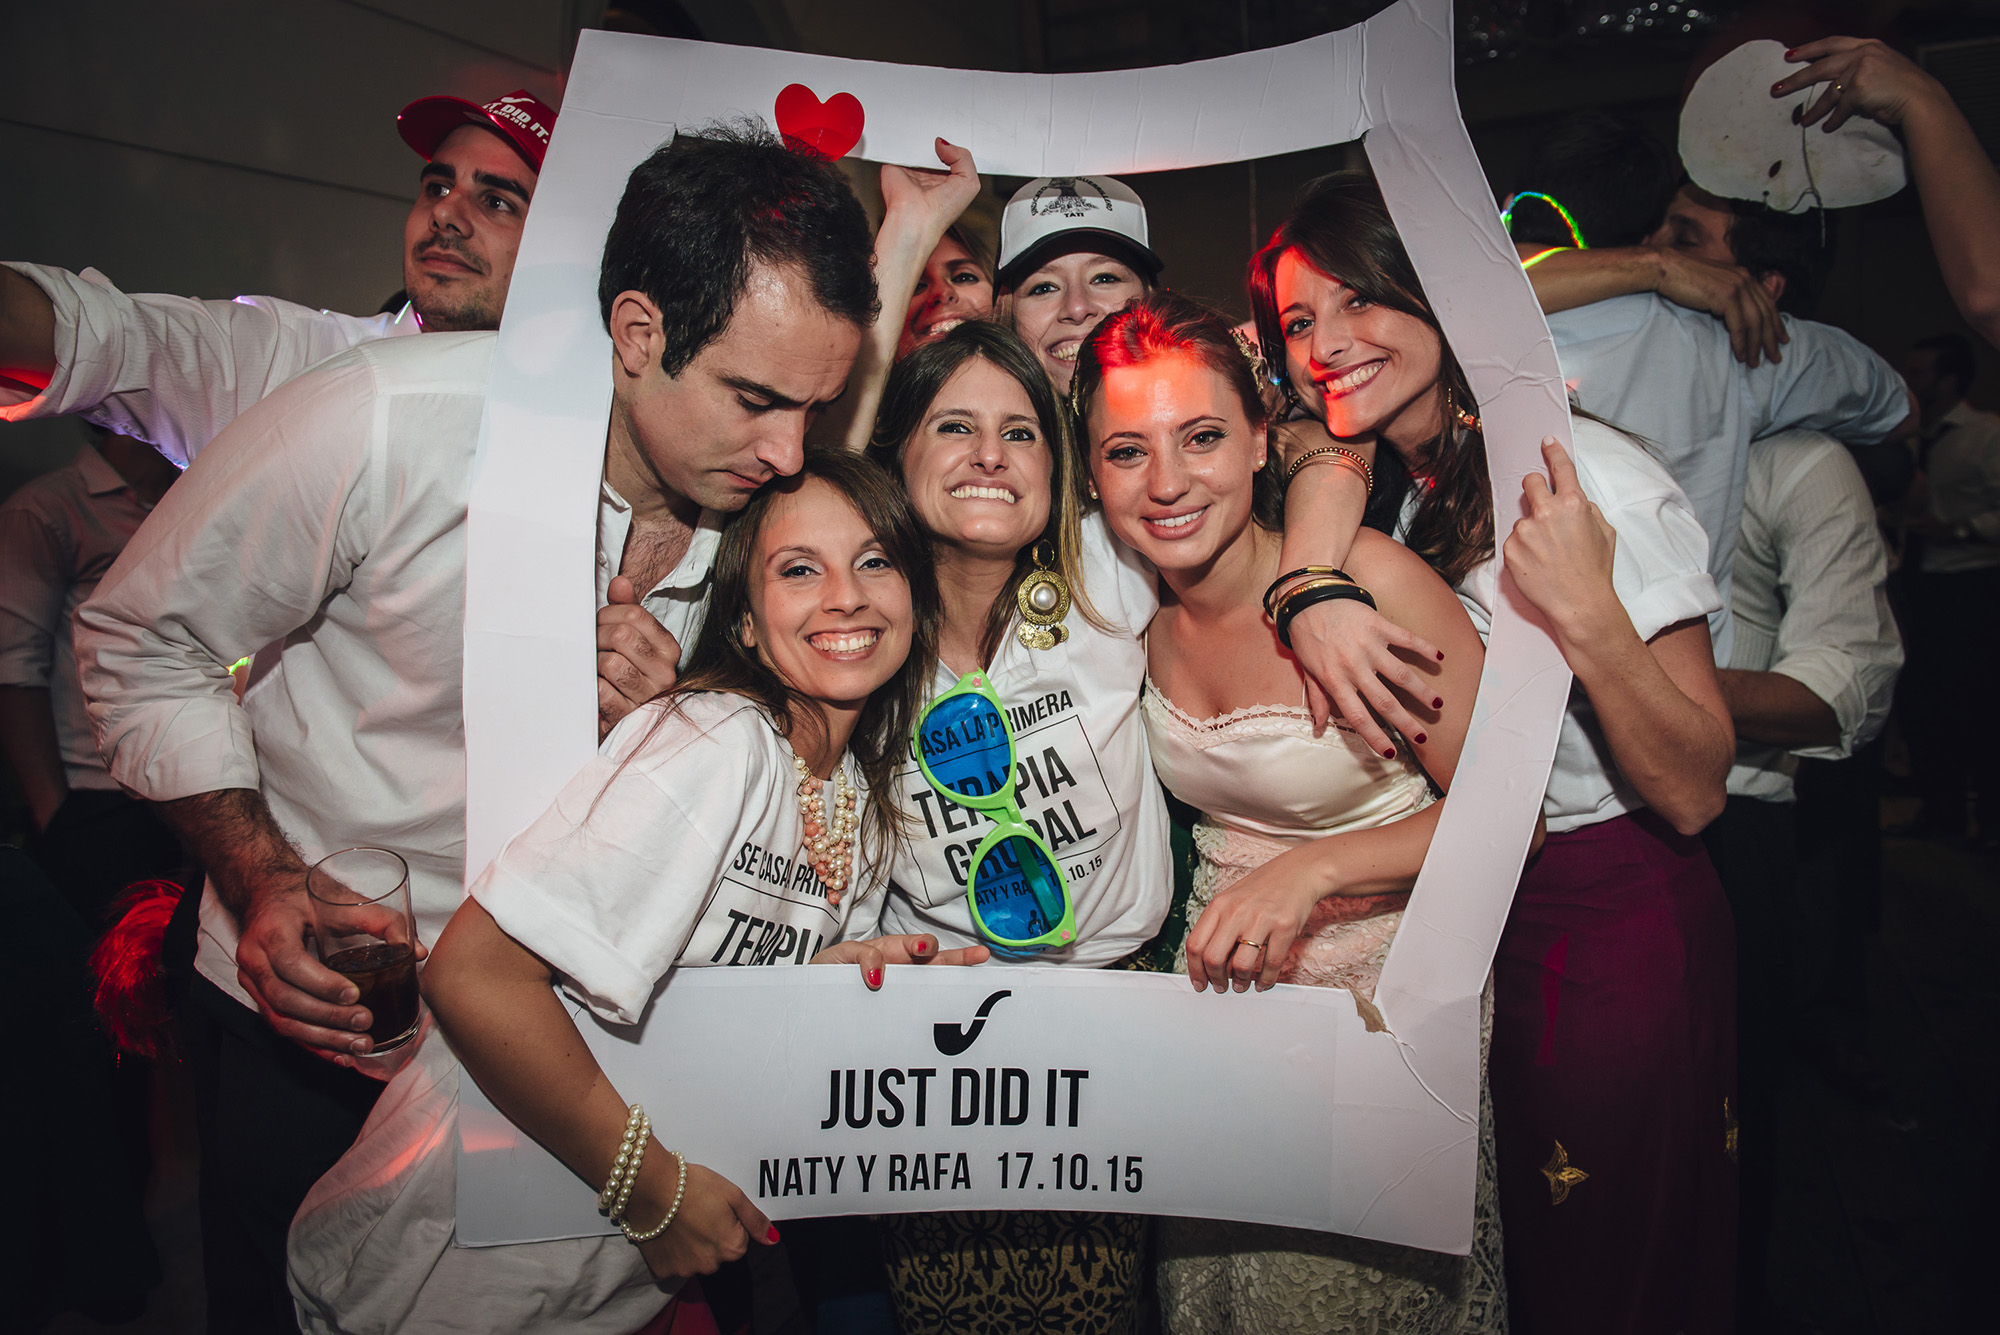 patricia-riba-casamiento-montevideo-uruguay-lindolfo-78